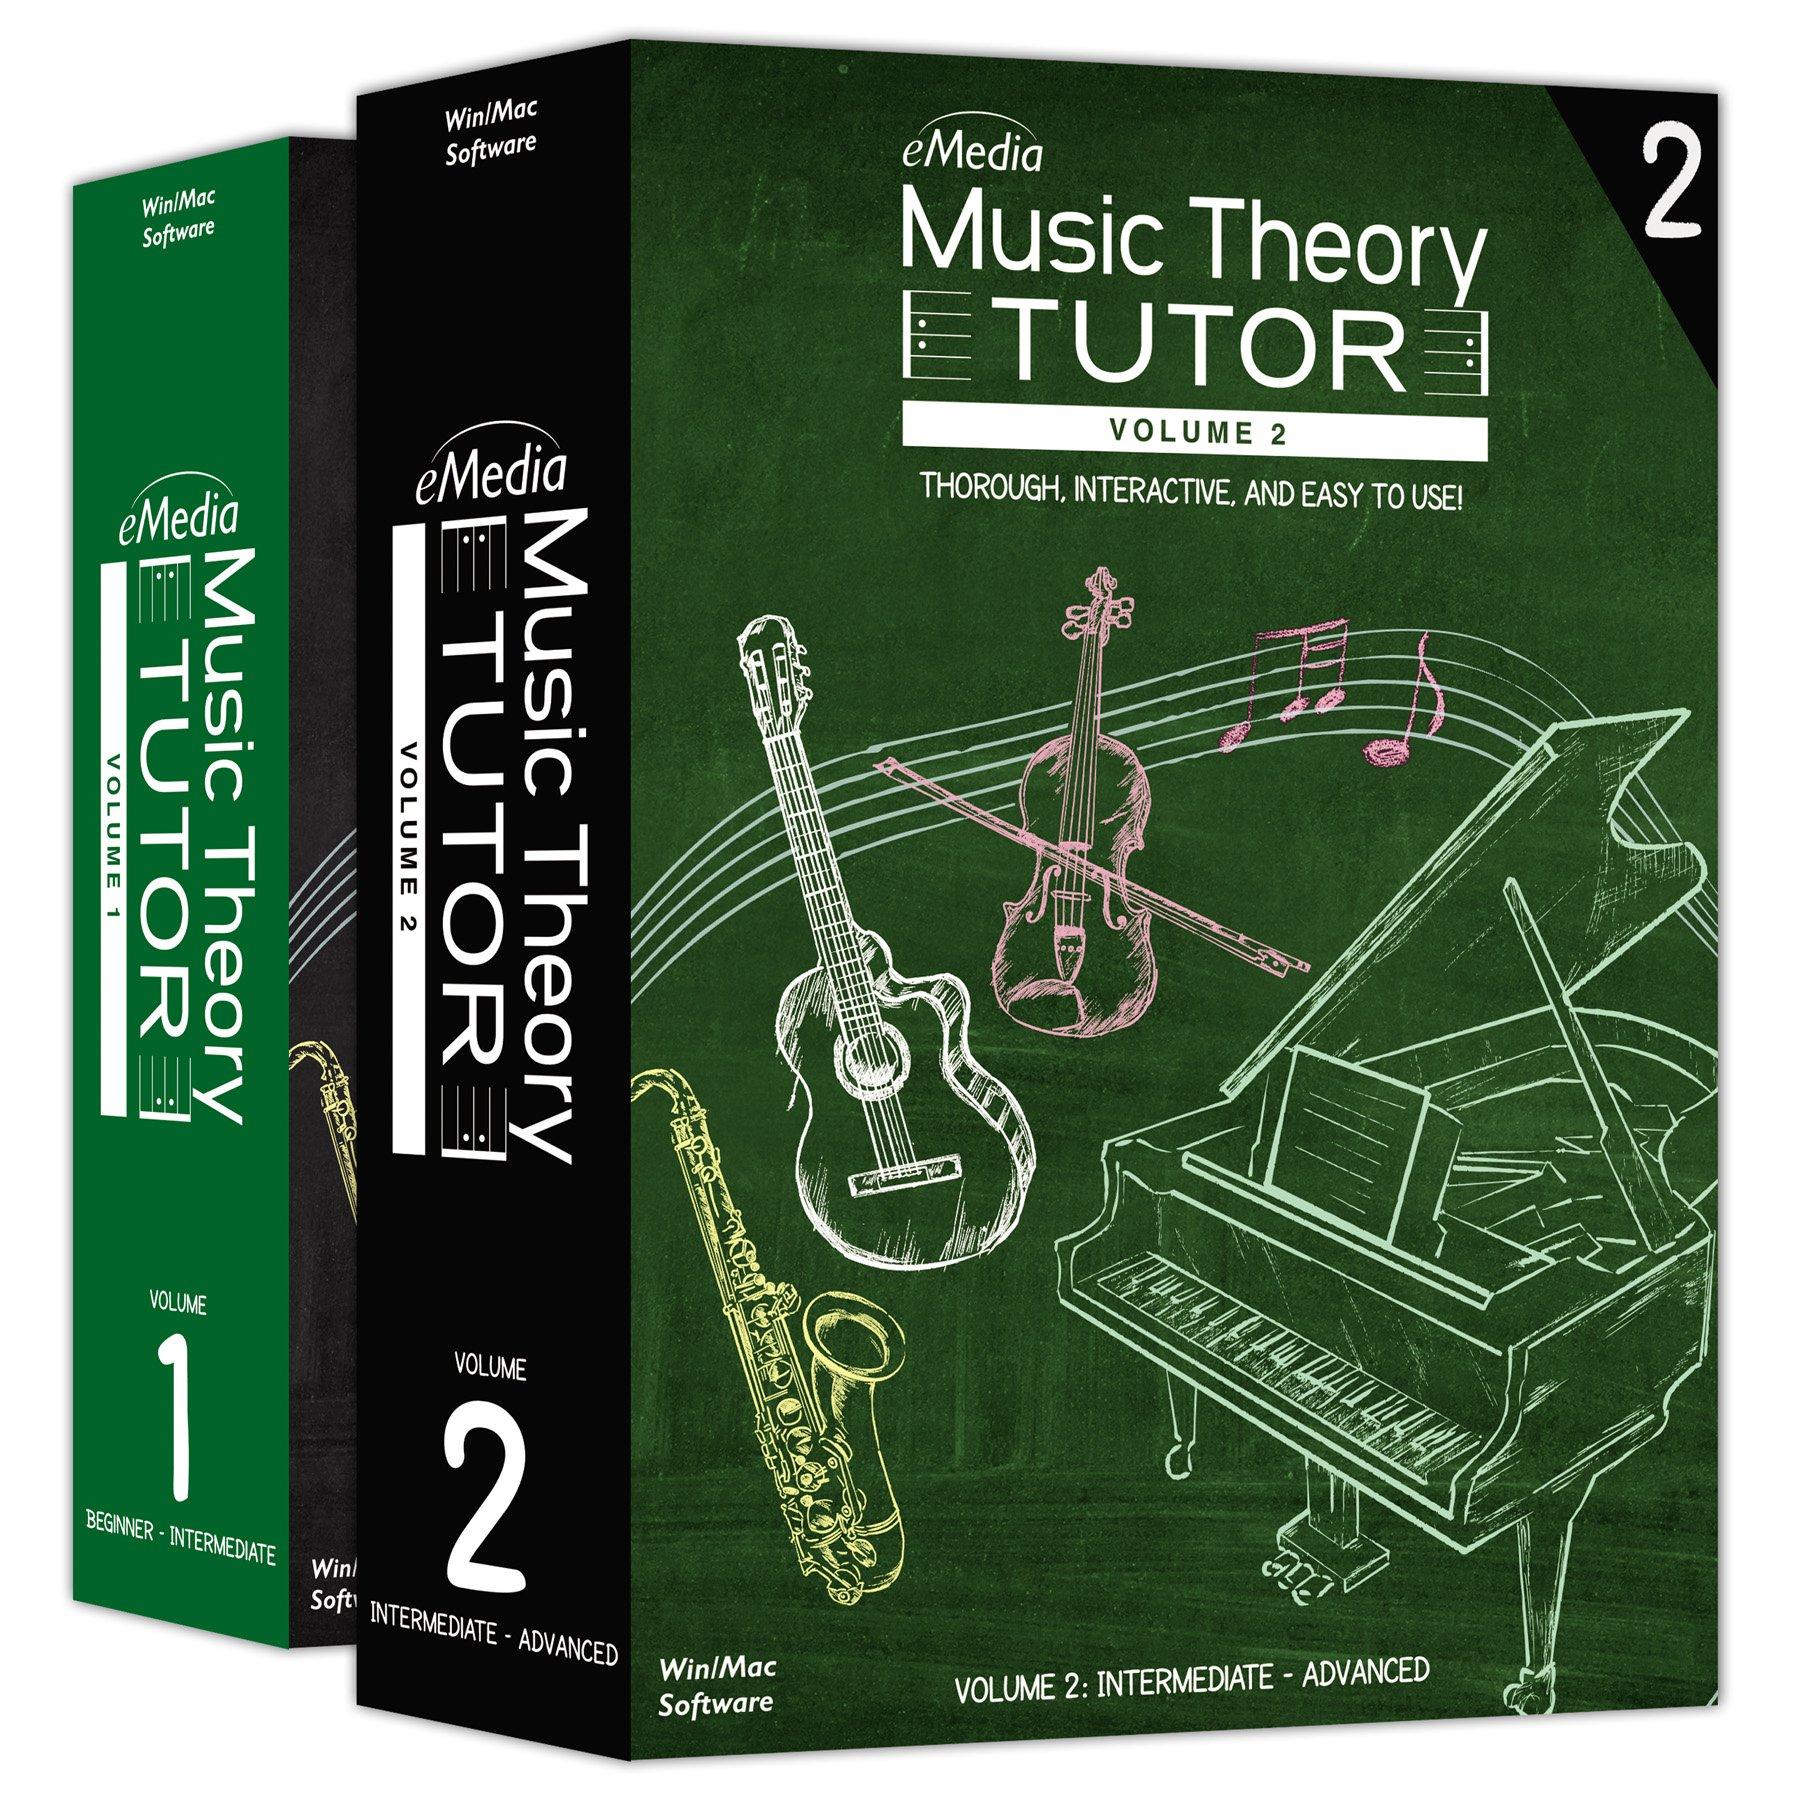 eMedia Music Theory Tutor Complete (Vol 1 & Vol 2) by eMedia